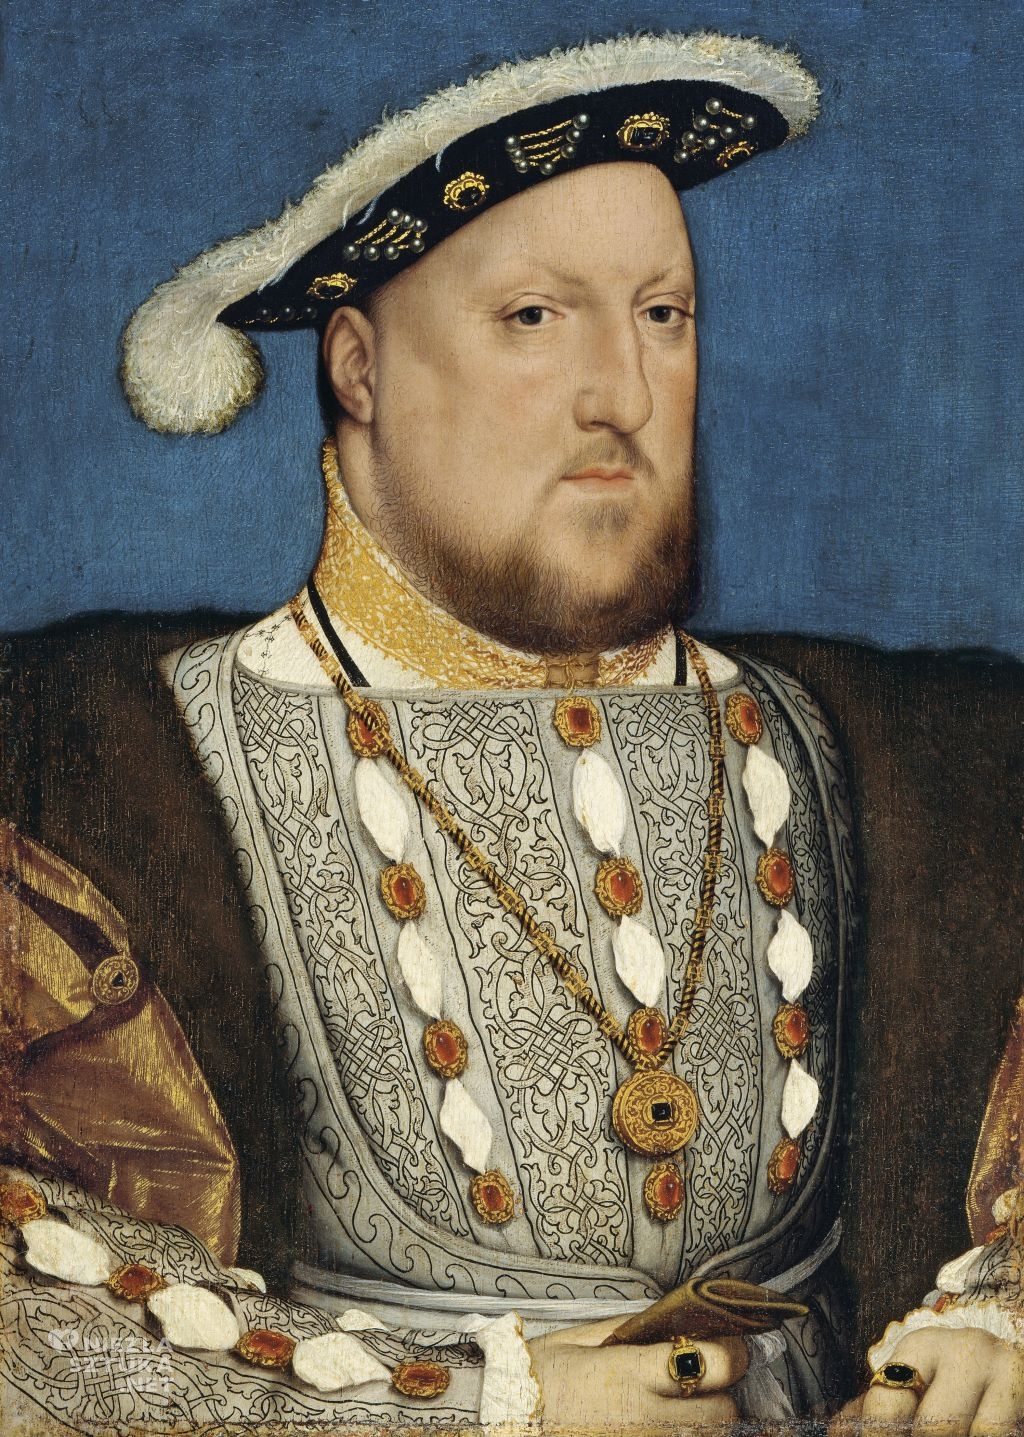 Hans Holbein Młodszy Portret Henryka VIII | 1537, Museo Thyssen-Bornemisza, Madryt